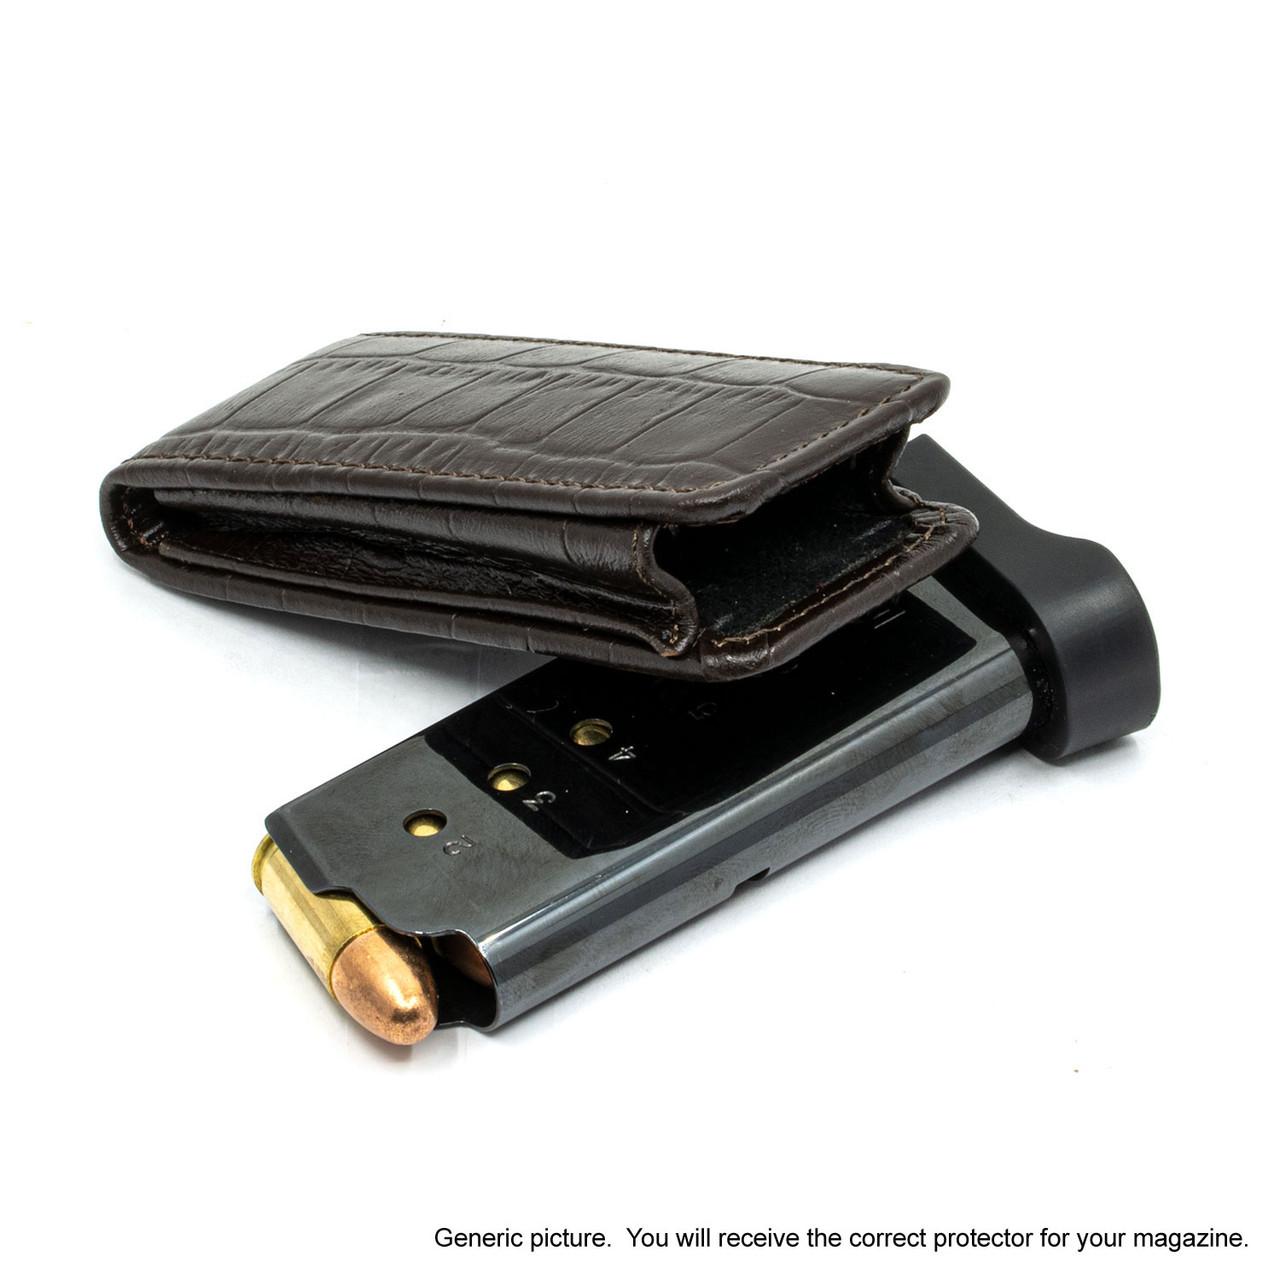 Taurus Millennium Pro 140 Brown Alligator Magazine Pocket Protector